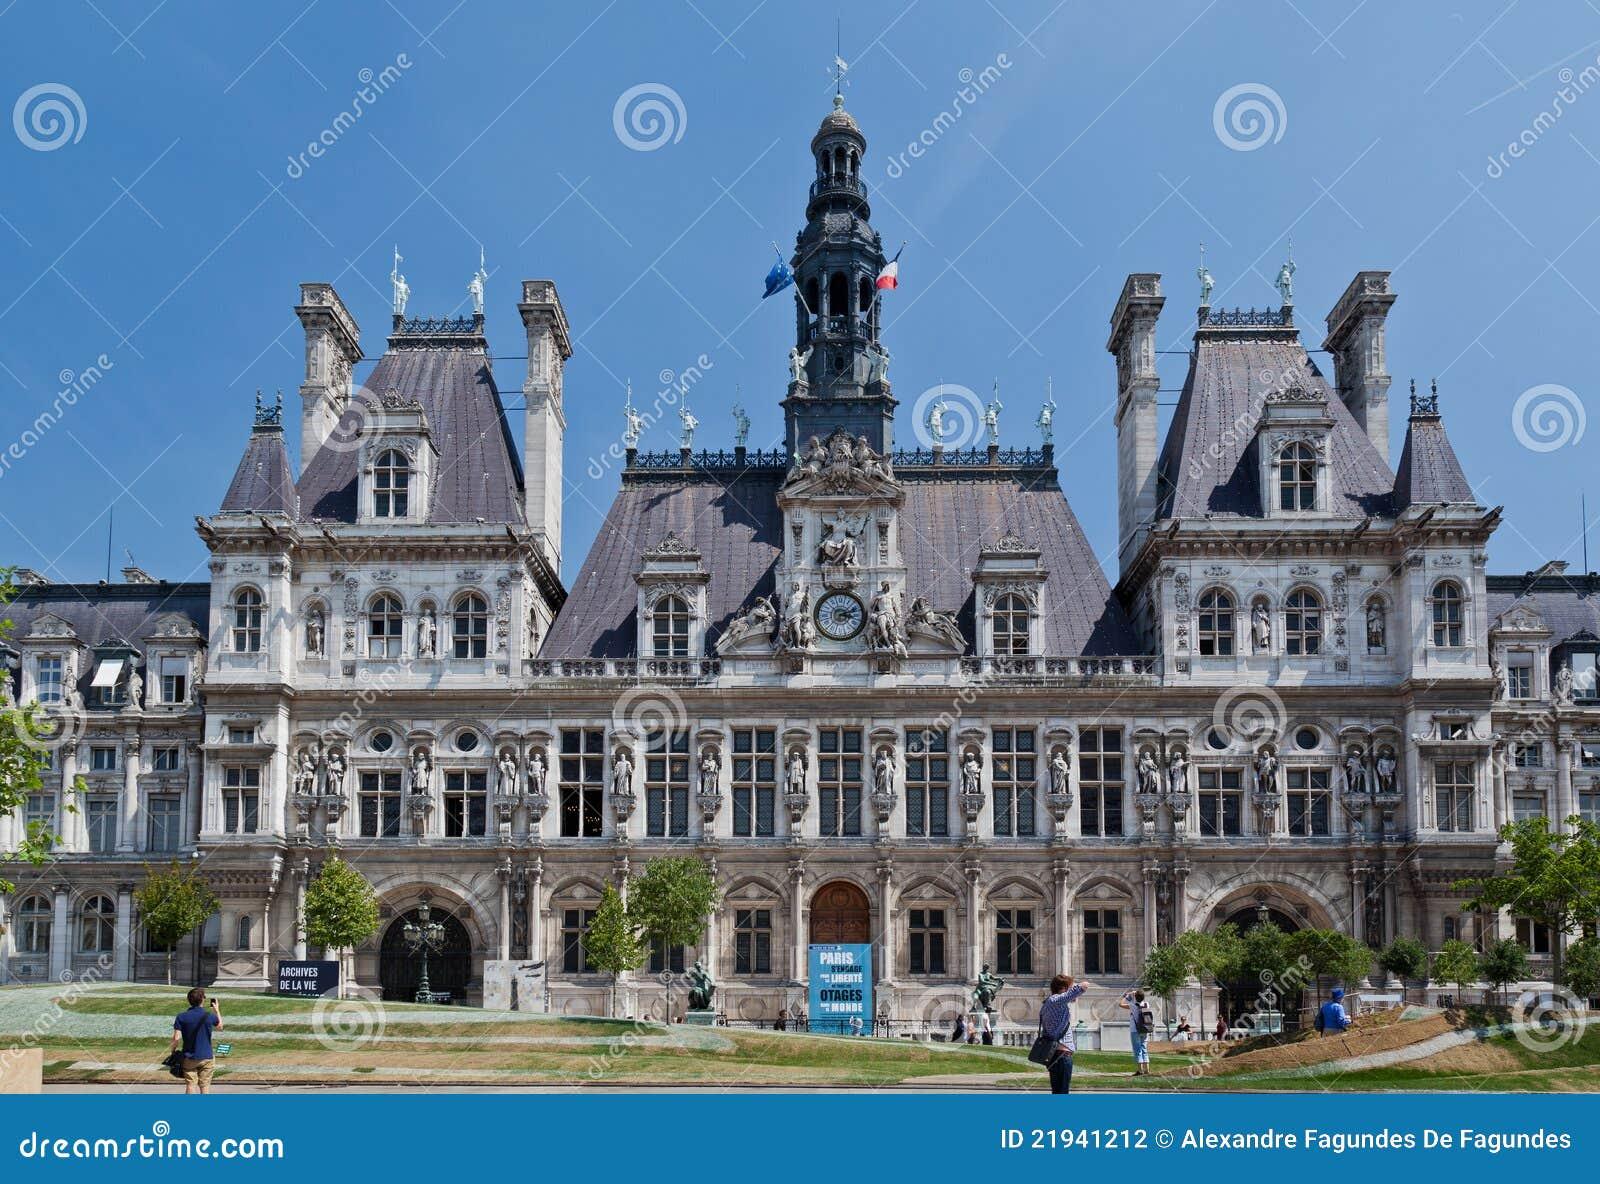 Hotel De Ville Paris Editorial Photography Image Of